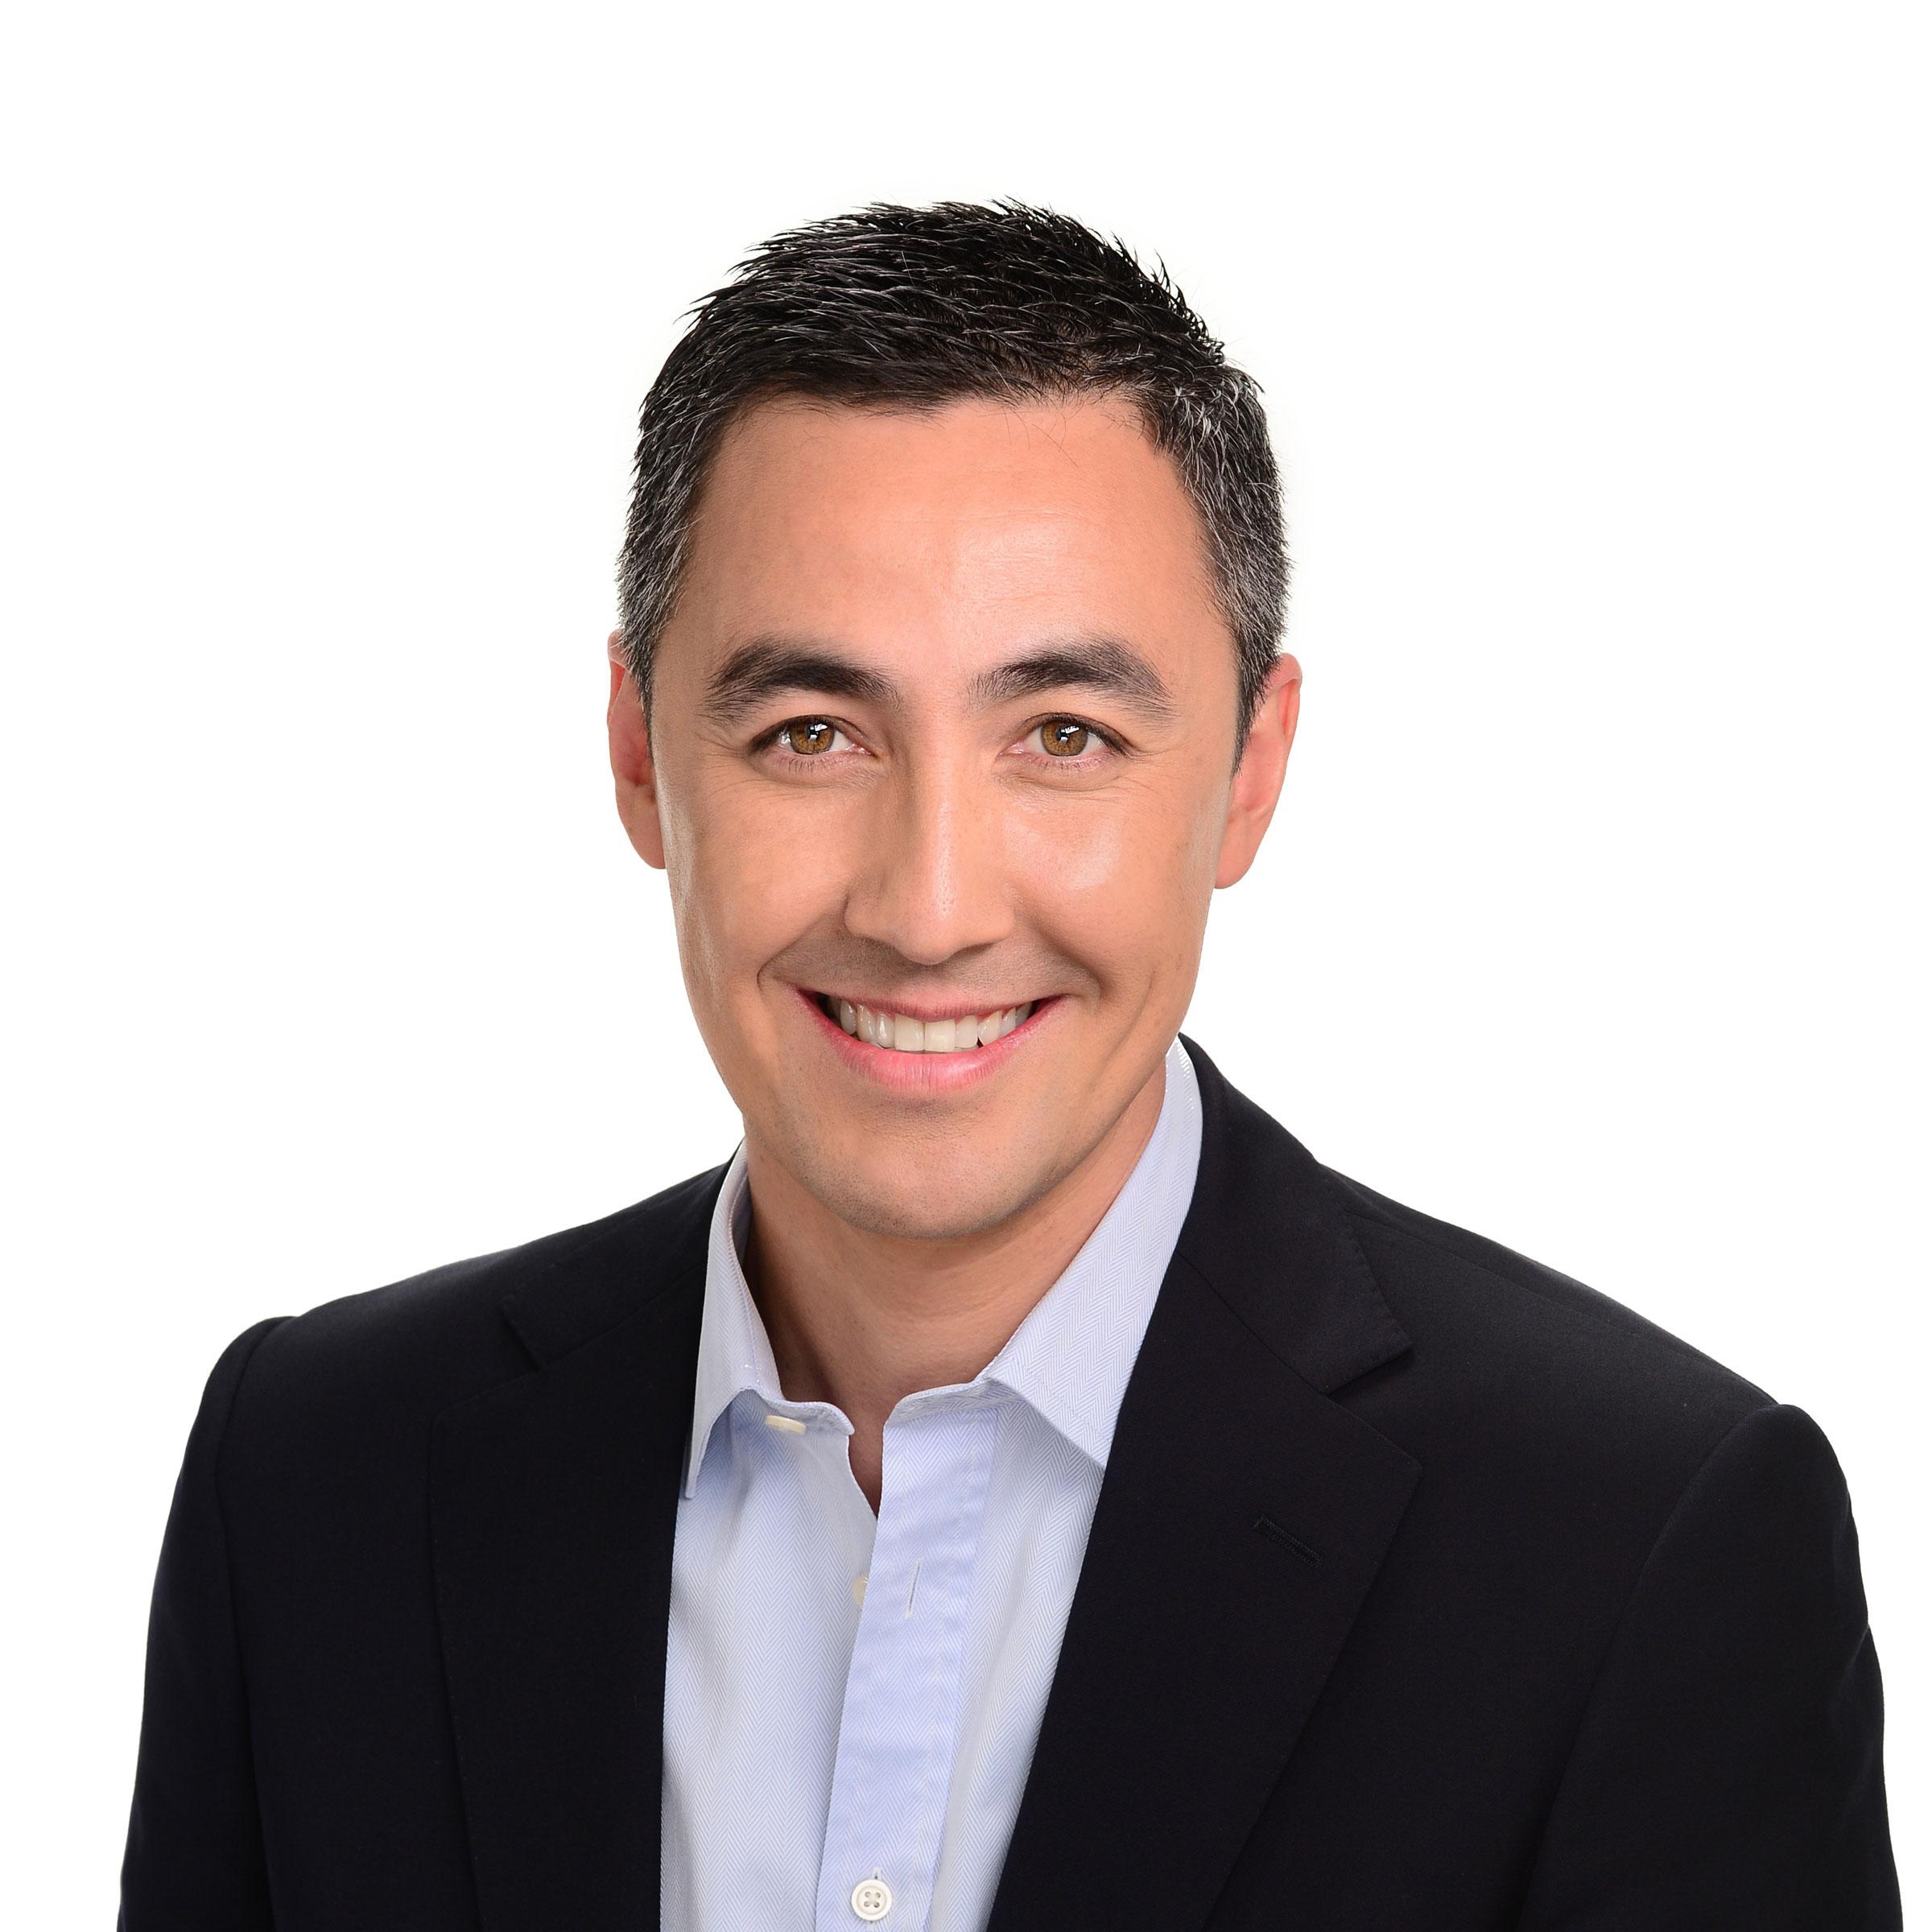 Dr Alex Phoon, Plastic, Reconstructive & Cosmetic Surgeon